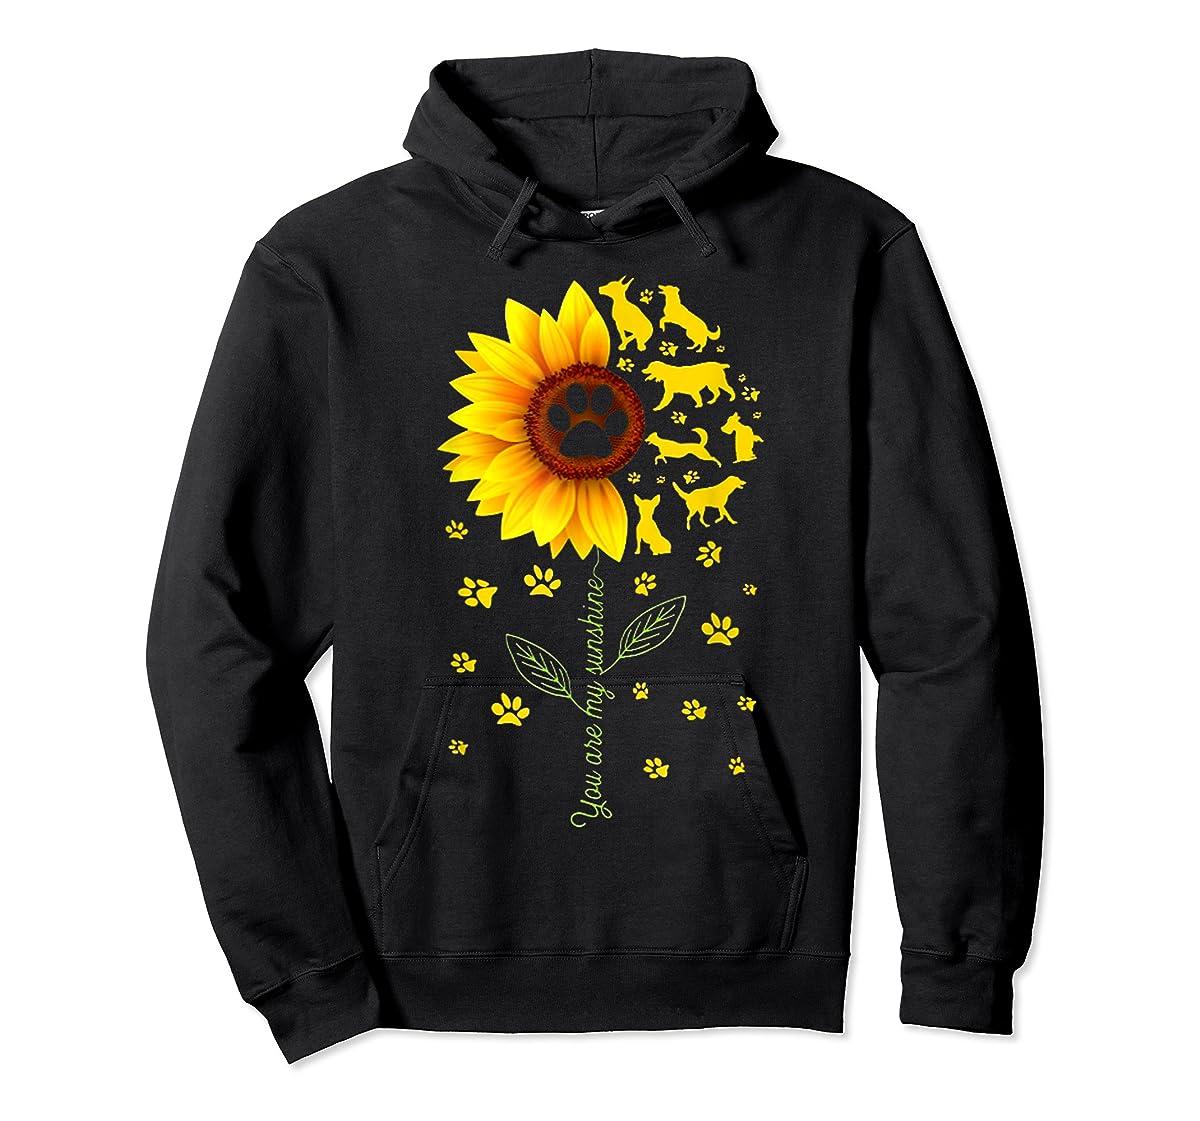 You are my Sunshine t-shirt-Hoodie-Black